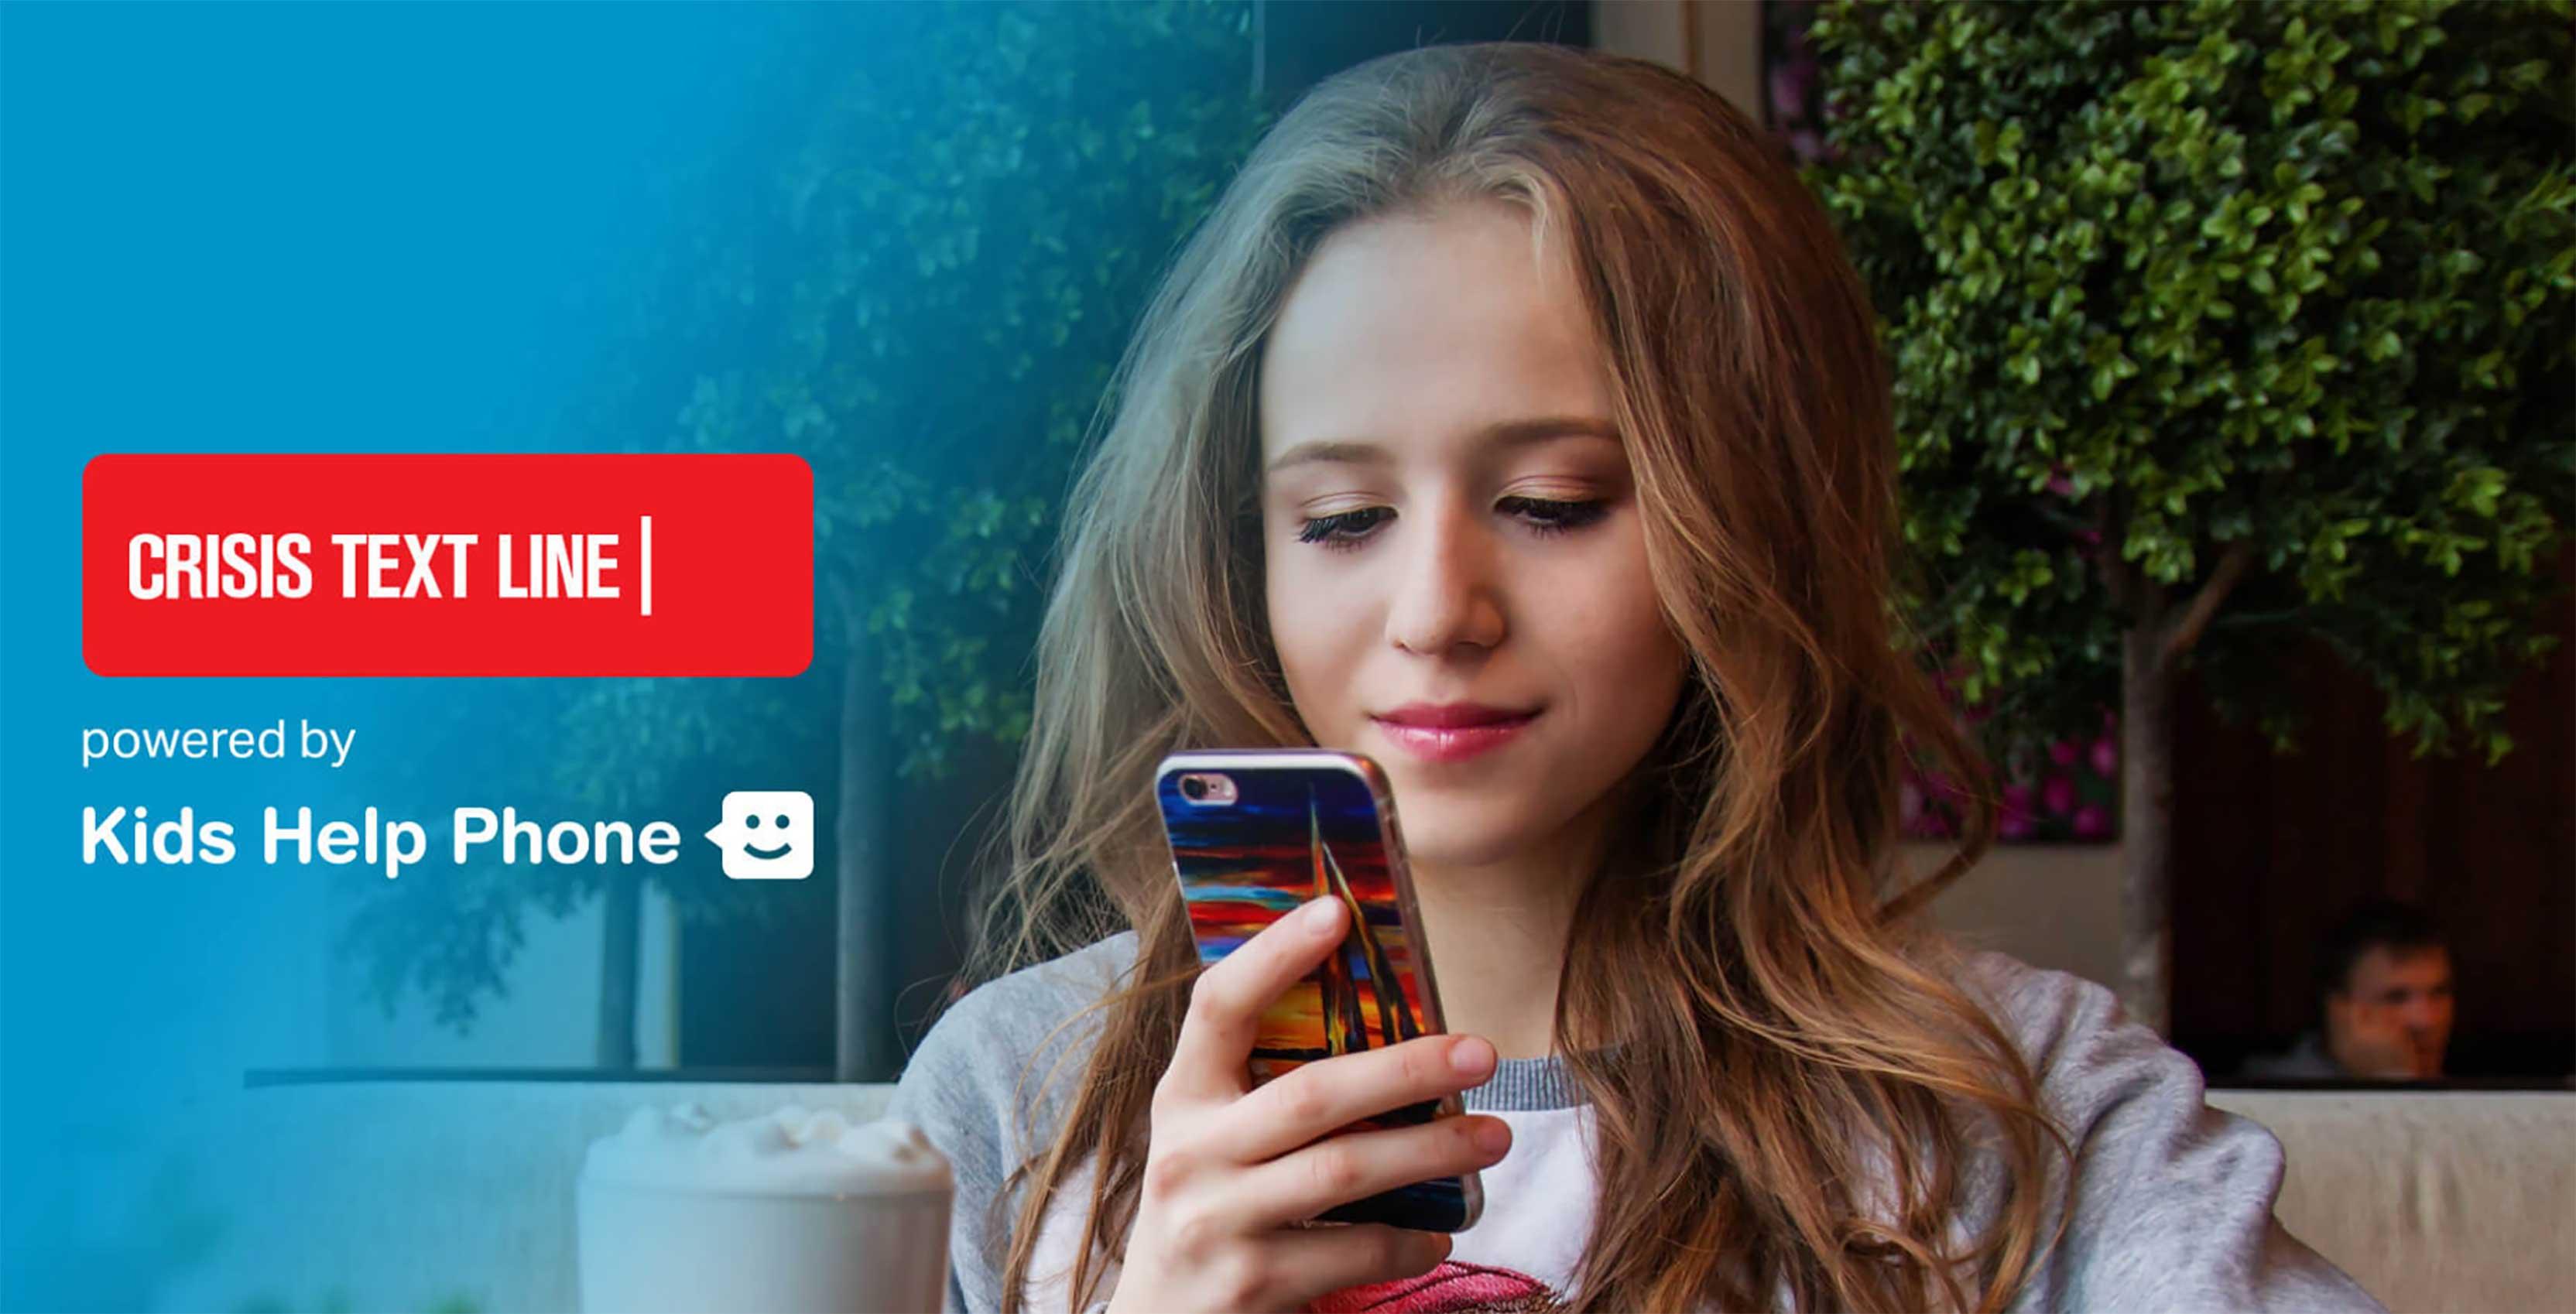 Kids Help Phone Crisis Text Line girl